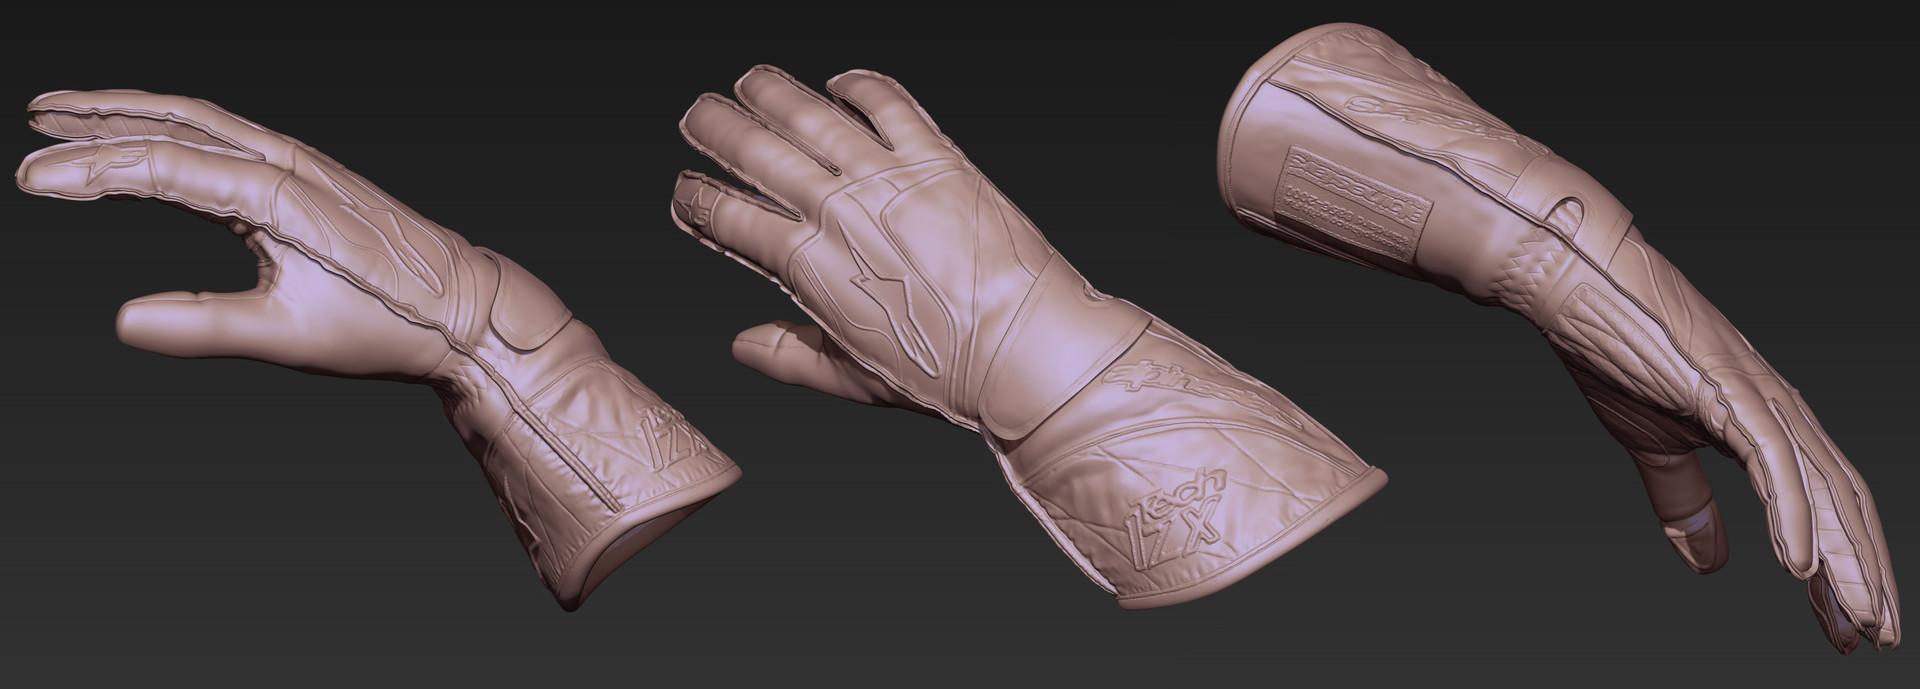 Toby hynes as gloves hi res